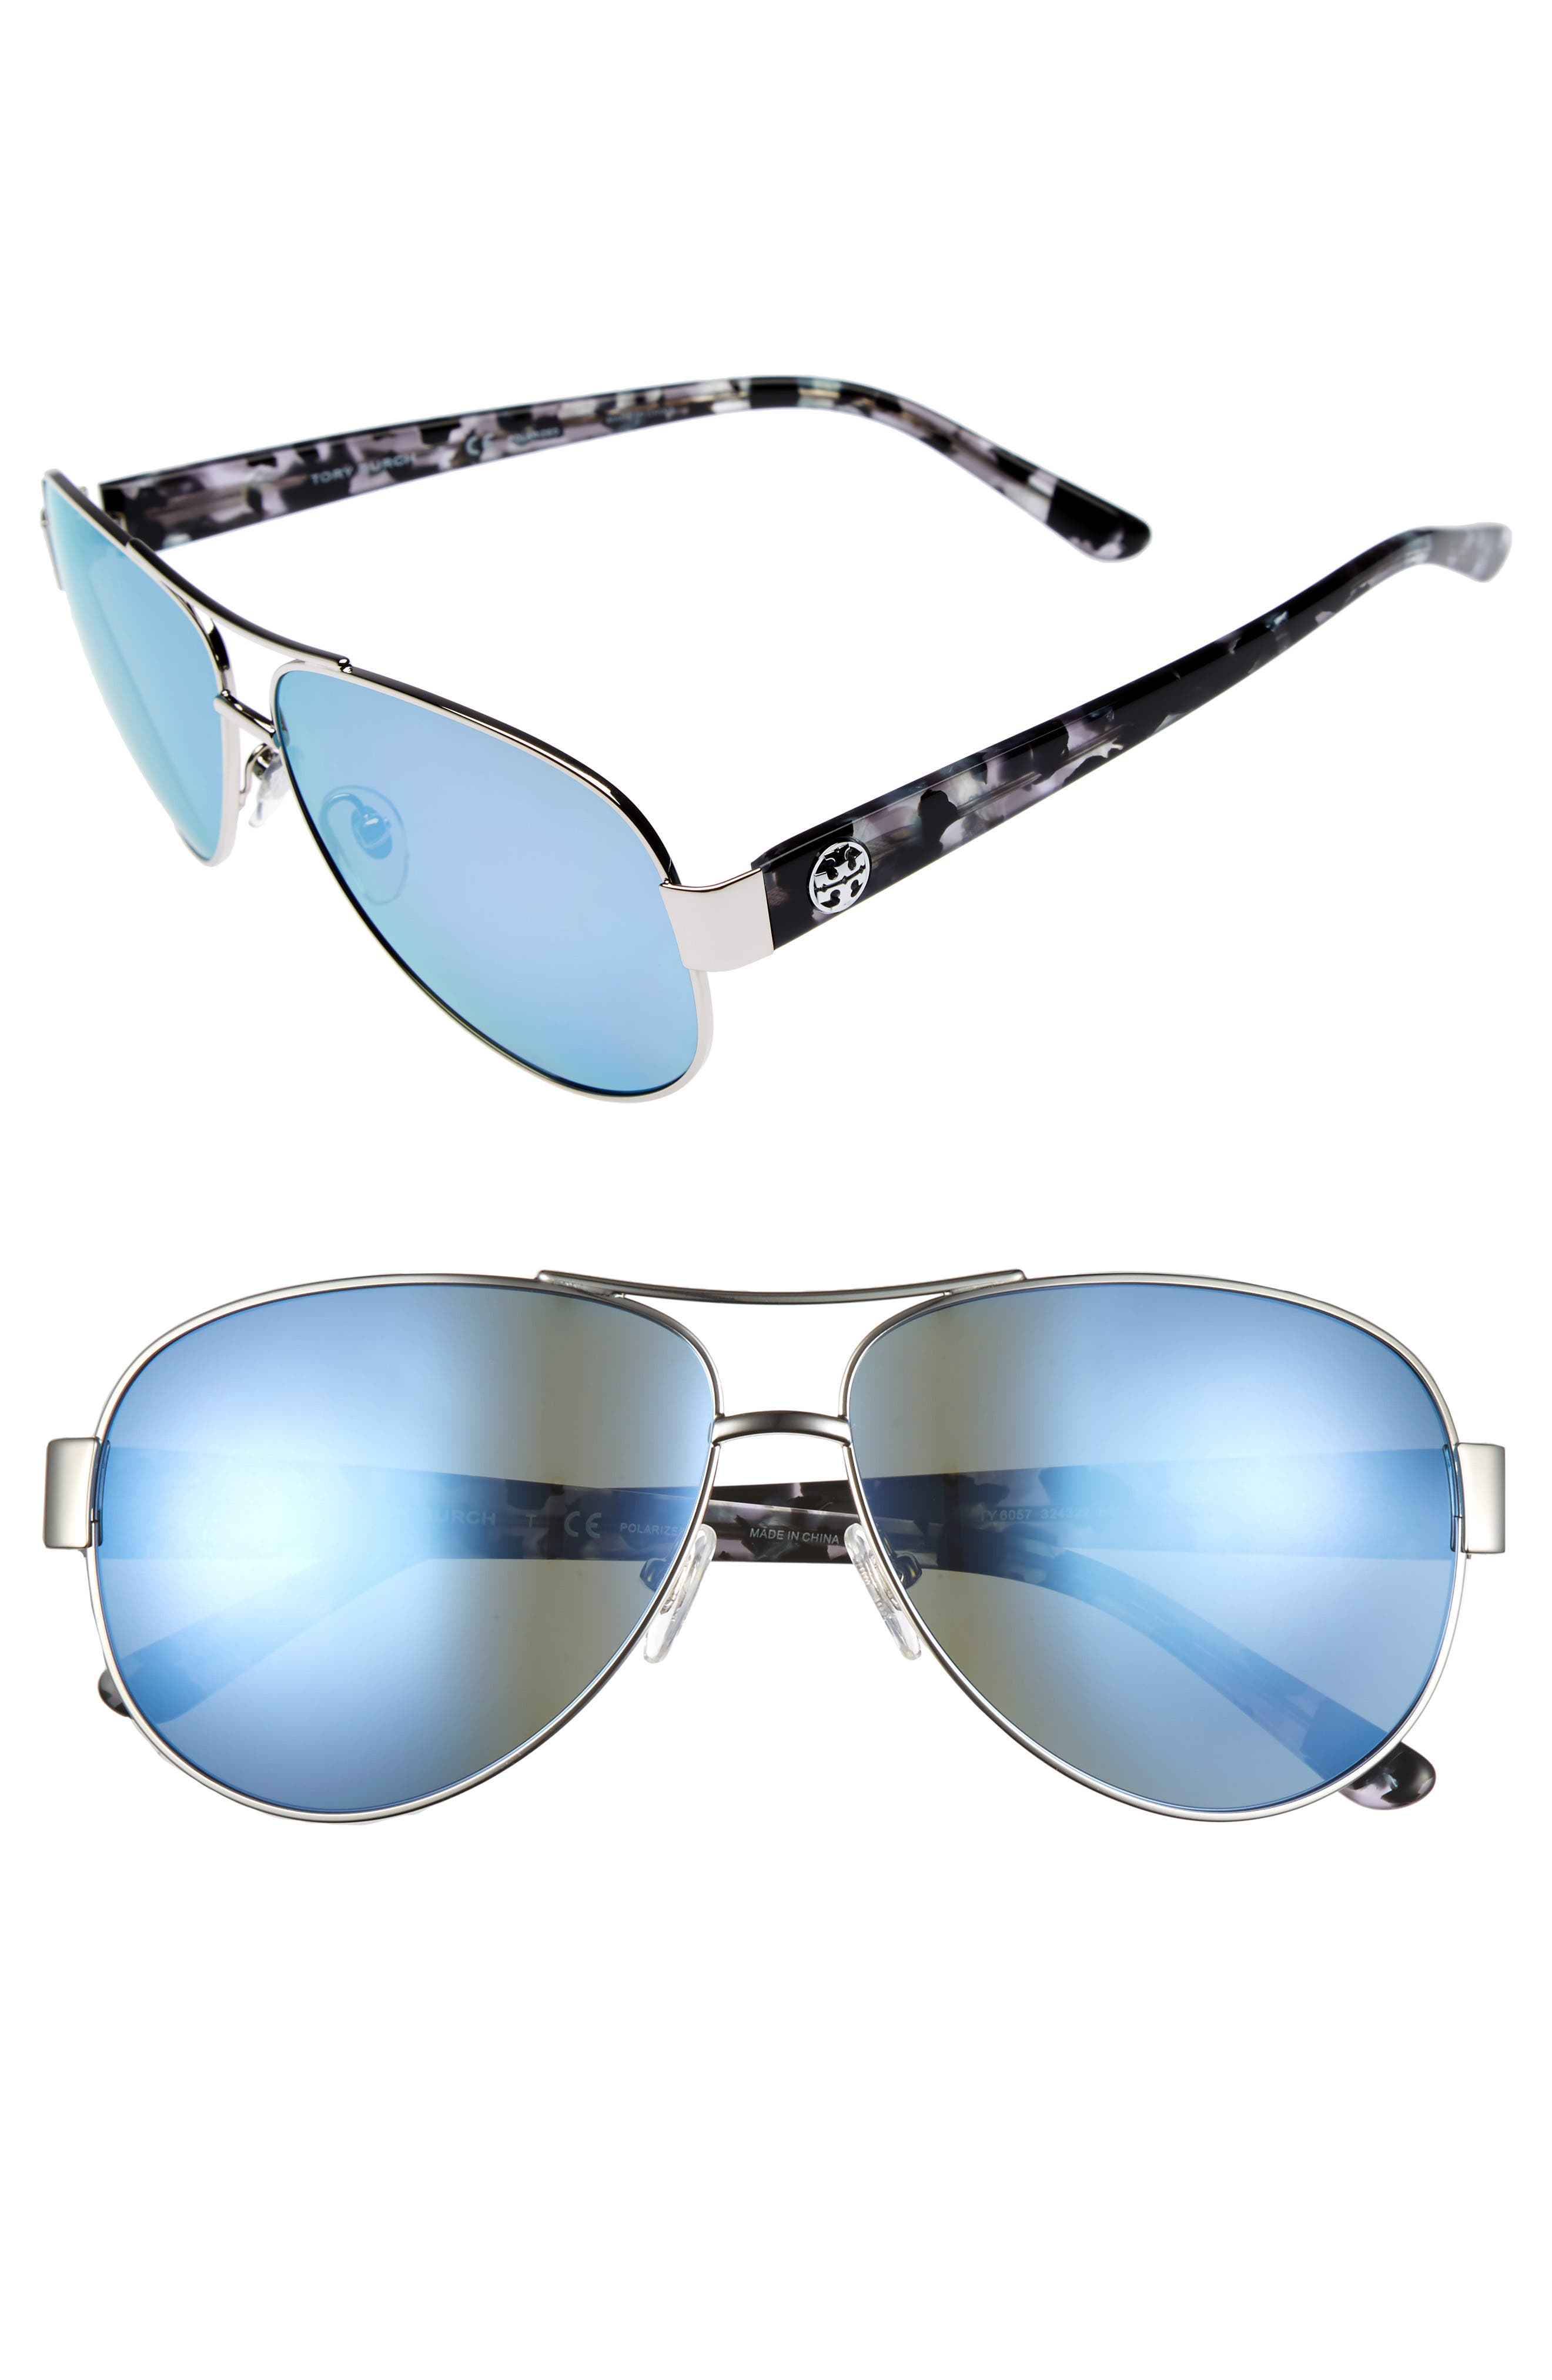 60mm Polarized Aviator Sunglasses,                         Main,                         color, 040